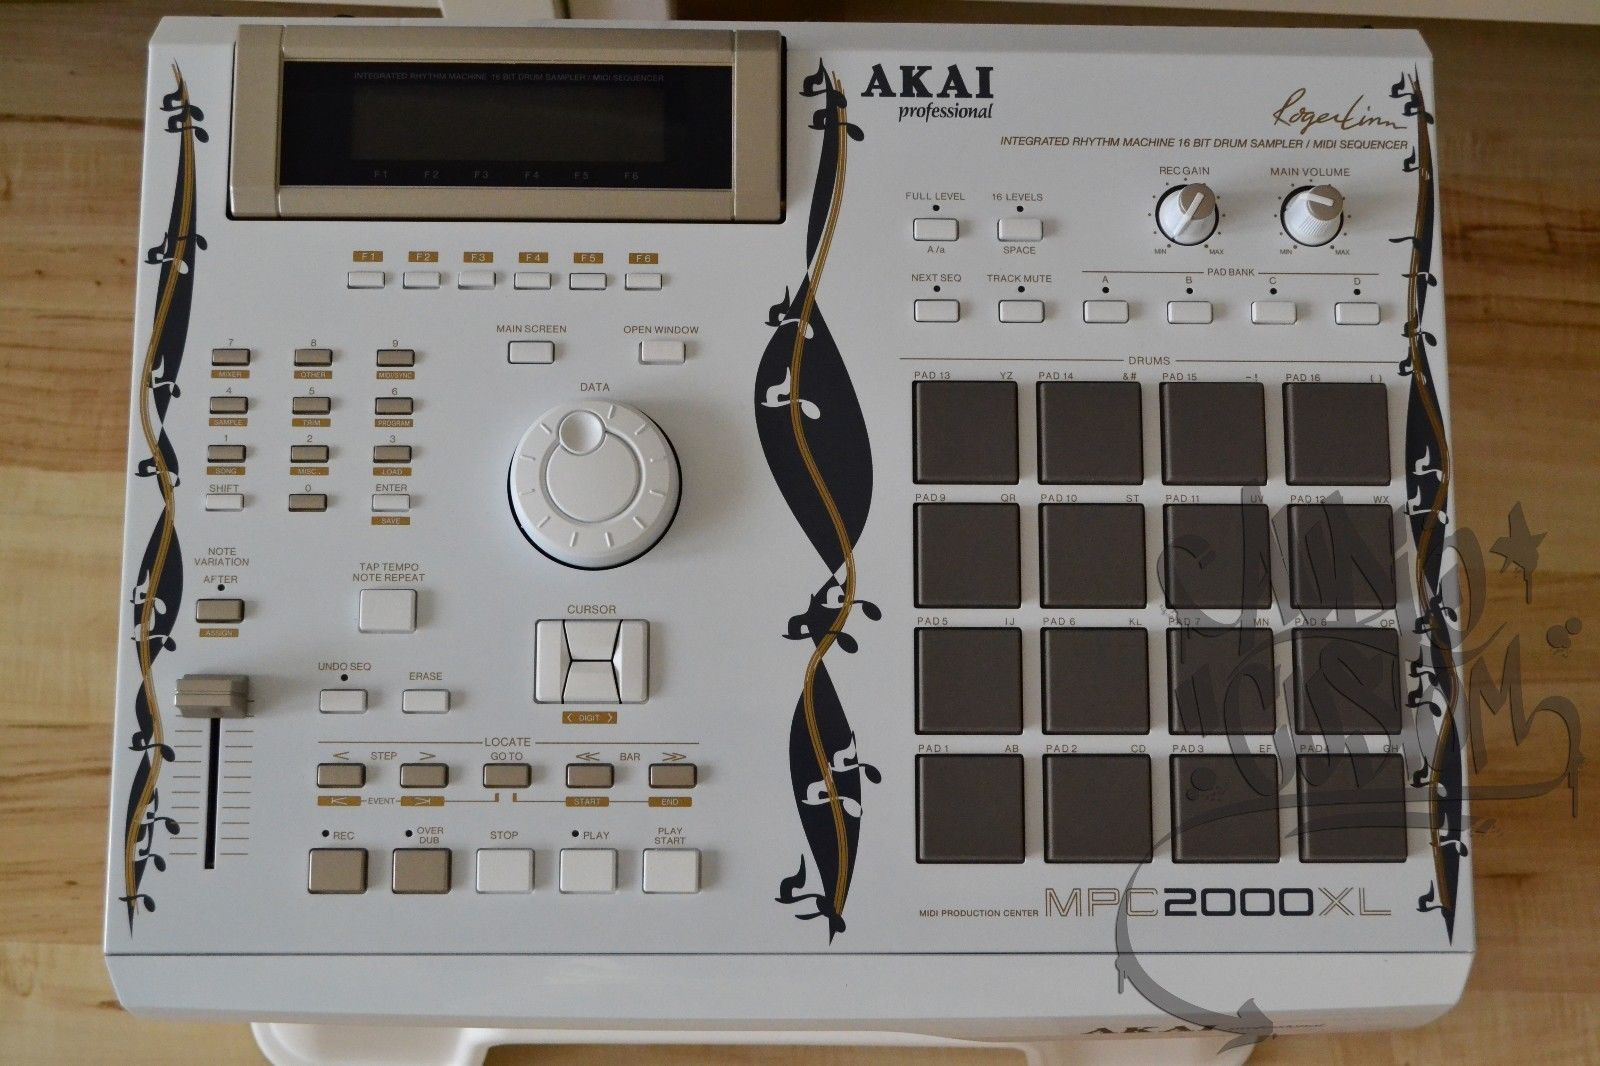 AKAI MPC 2000XL INTERNAL CHASSIS